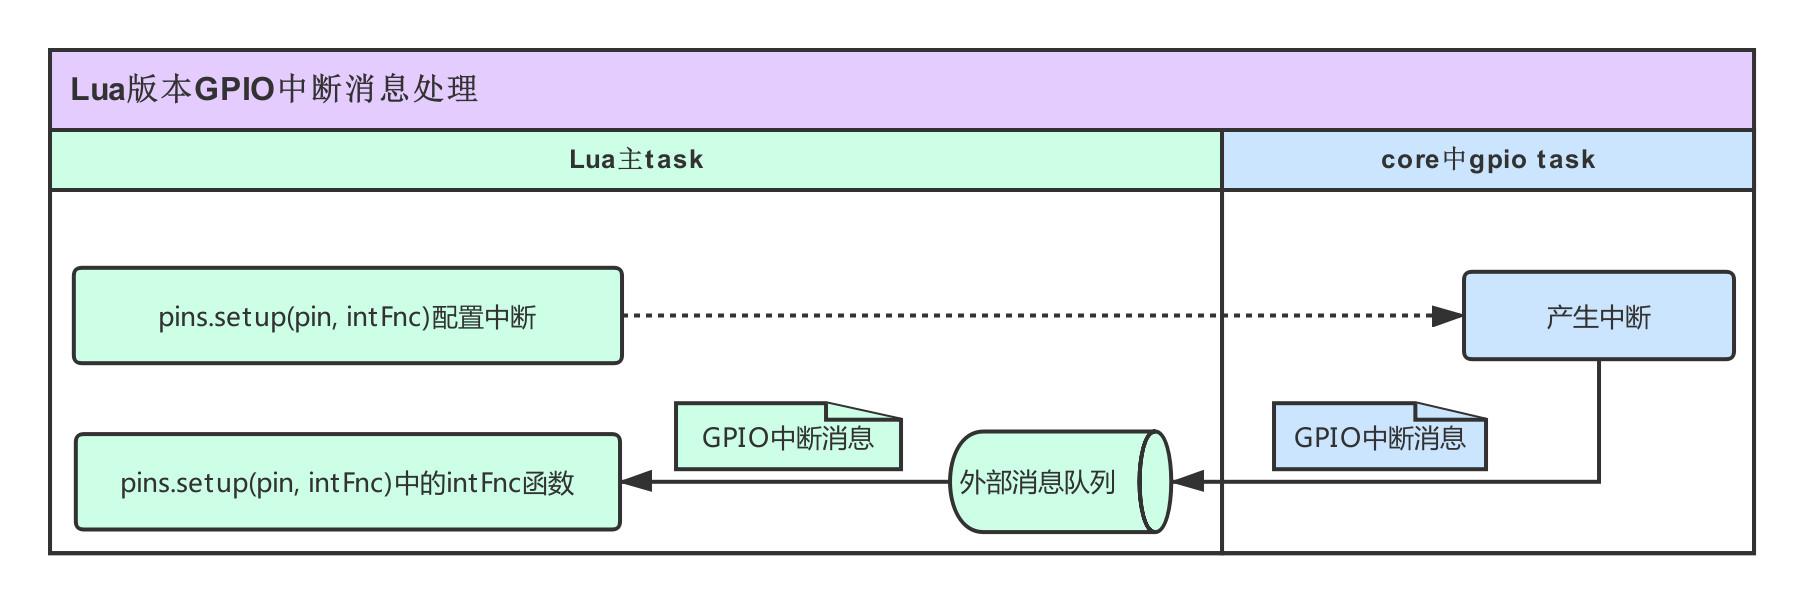 Air系列模块Lua版本应用运行框架概述